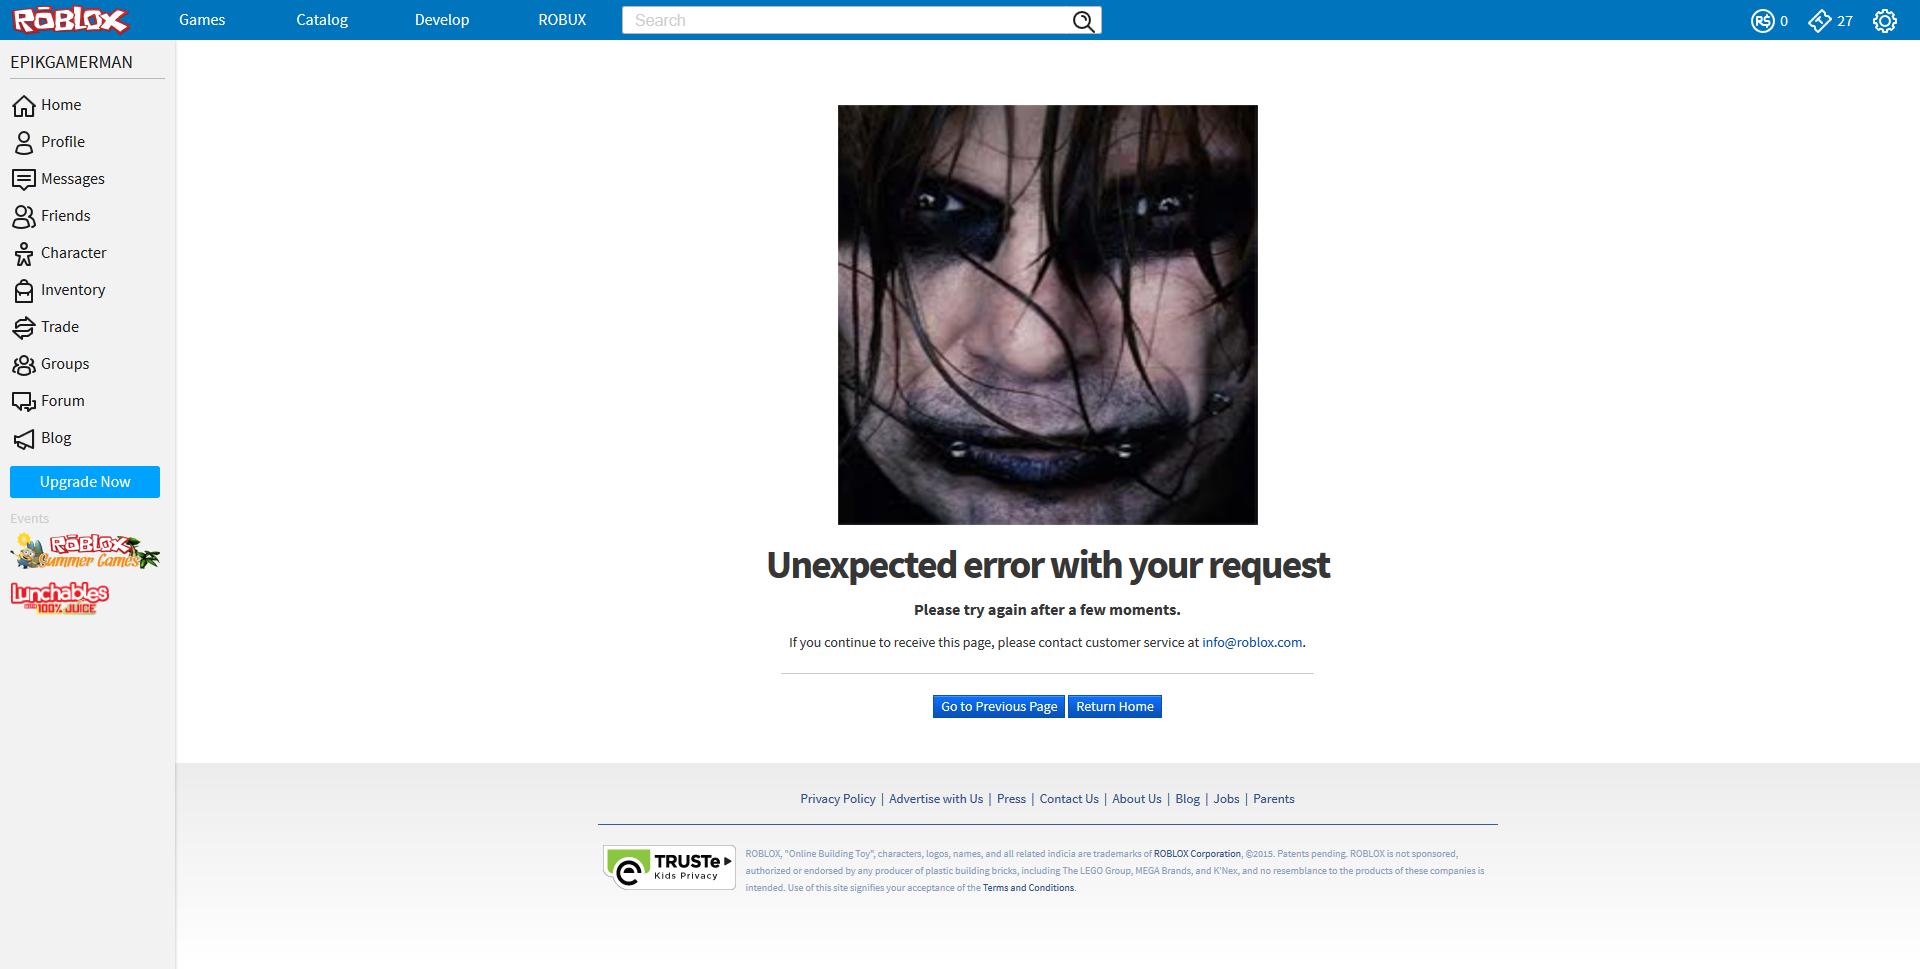 User Blogtrtrtrtrtrt5555history Woman Roblox Creepypasta Wiki